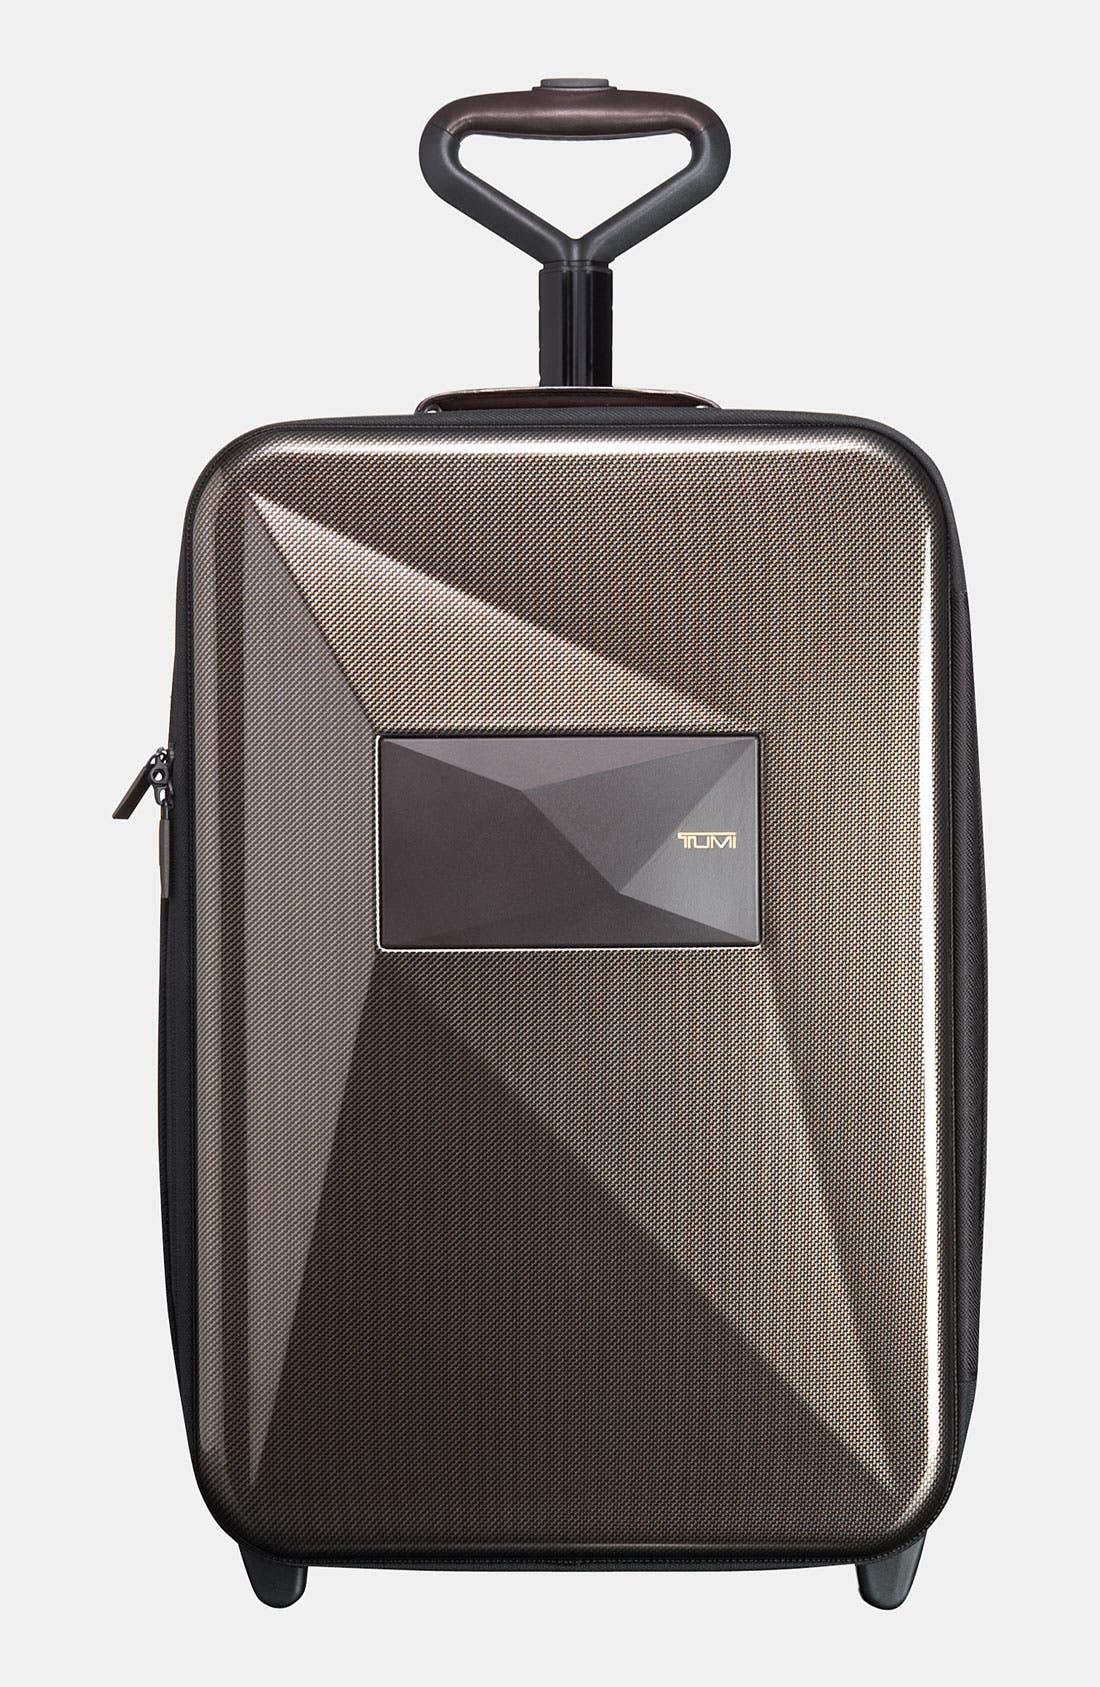 Alternate Image 1 Selected - Tumi 'Dror' International Expandable Carry-On